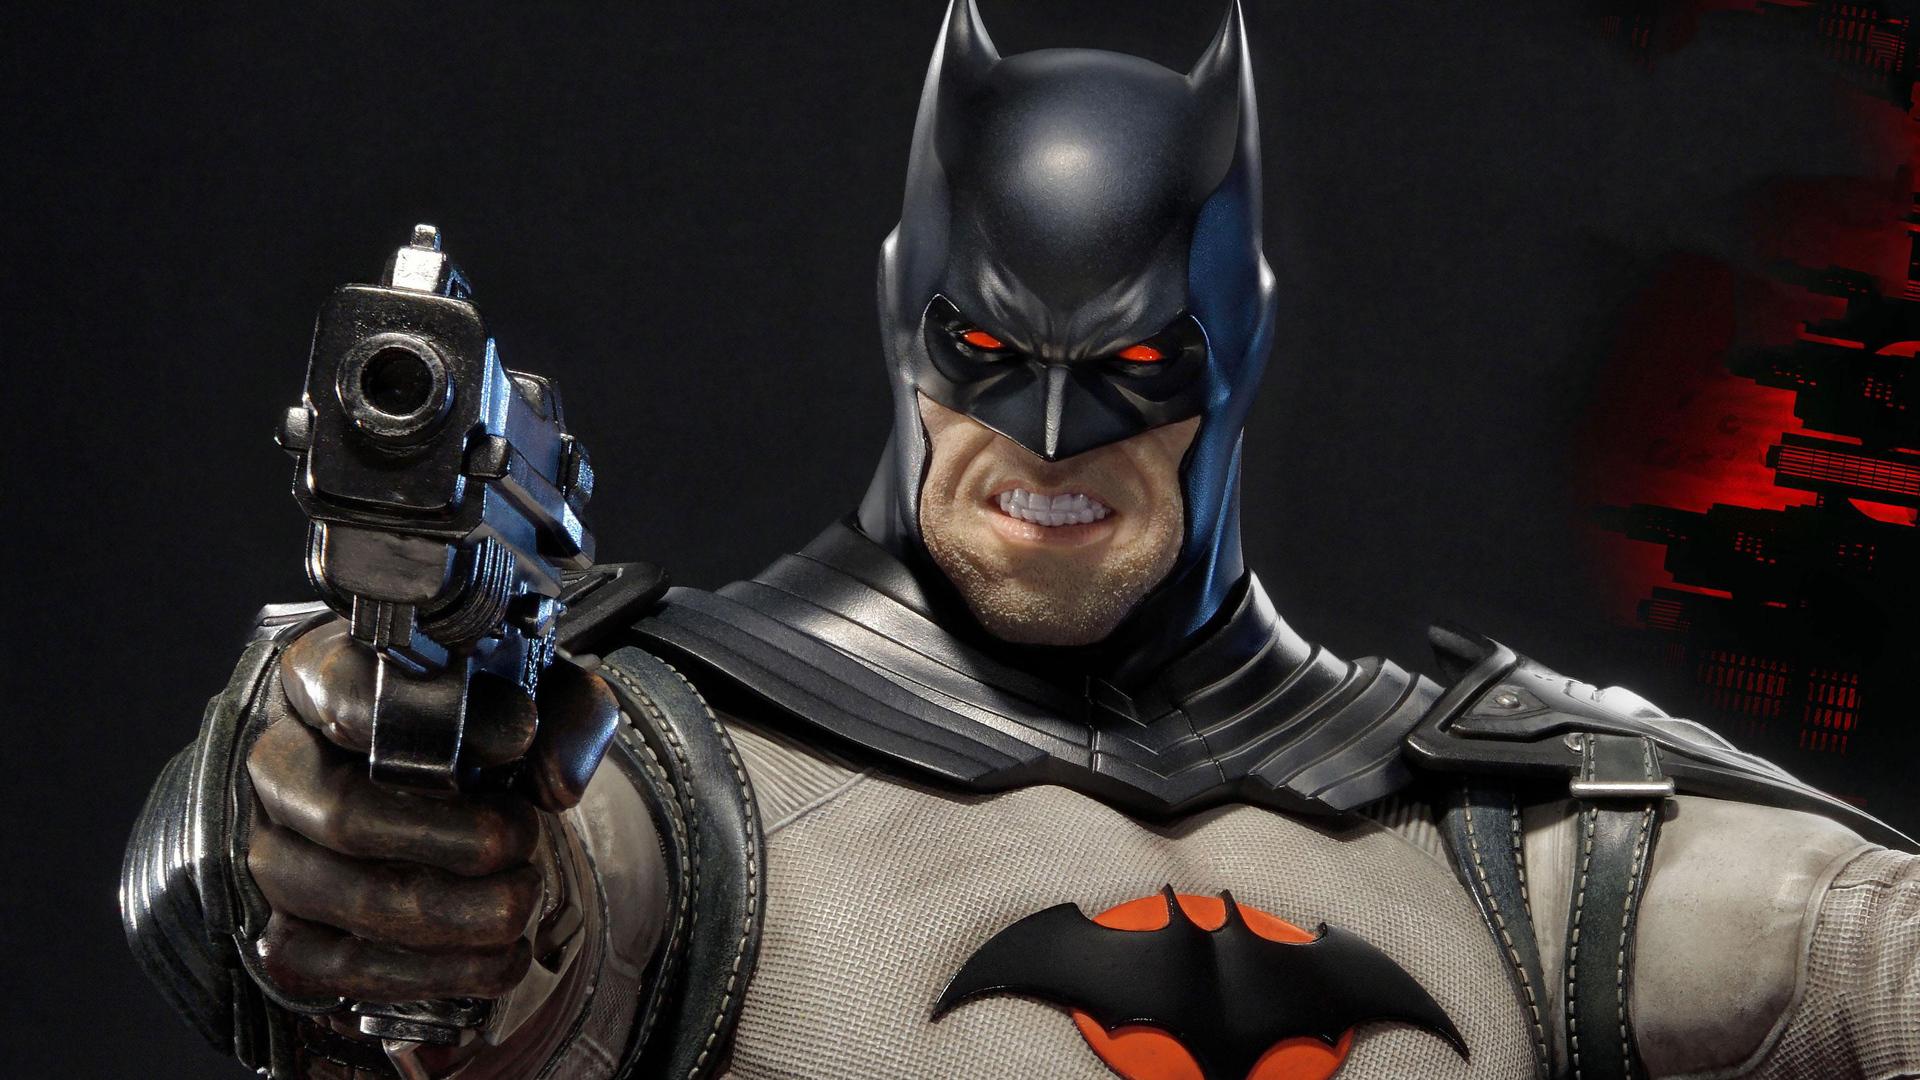 1920x1080 Batman With Gun Laptop Full HD 1080P HD 4k ...